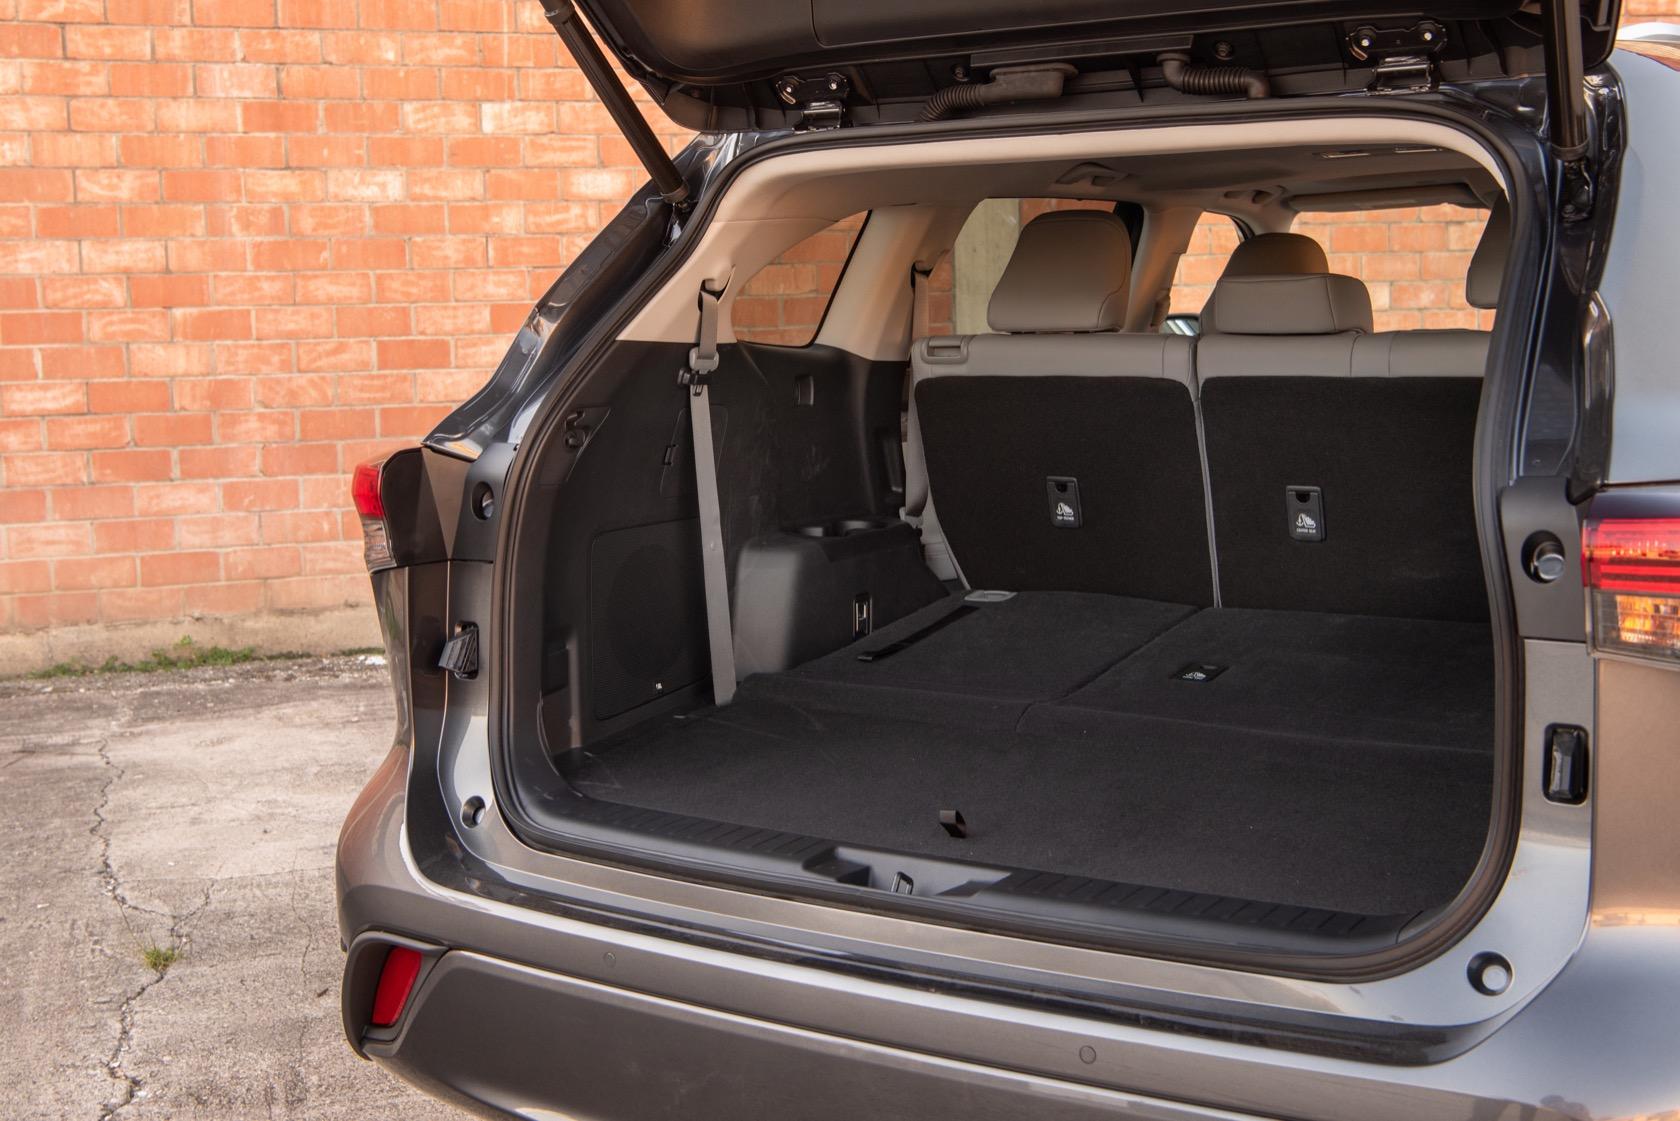 2020 Toyota Highlander Official 8 Seats Hybrid Tech